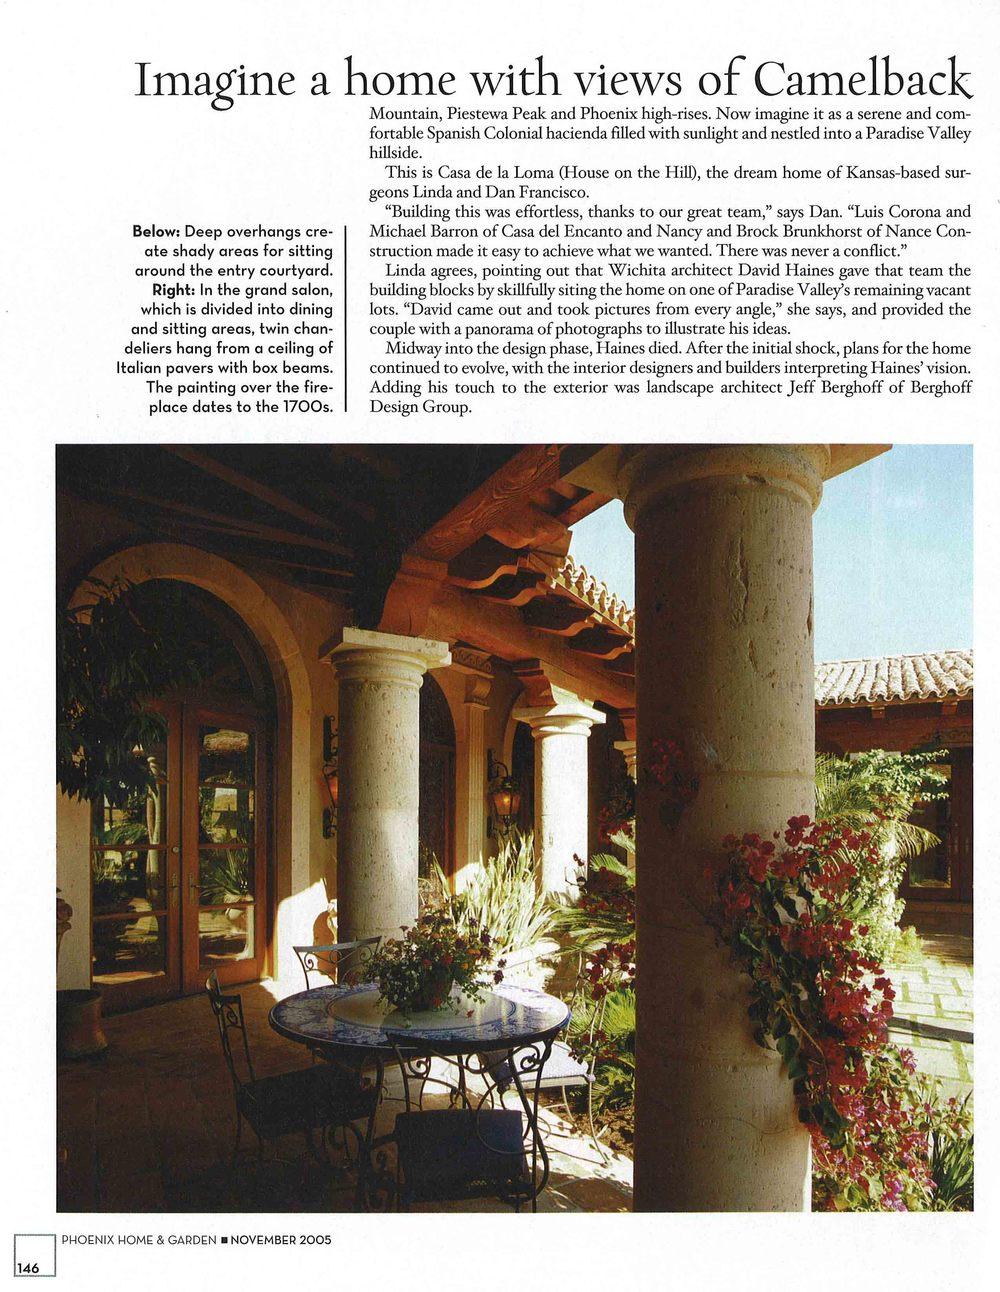 PHGnov05 pg 4 72.jpg